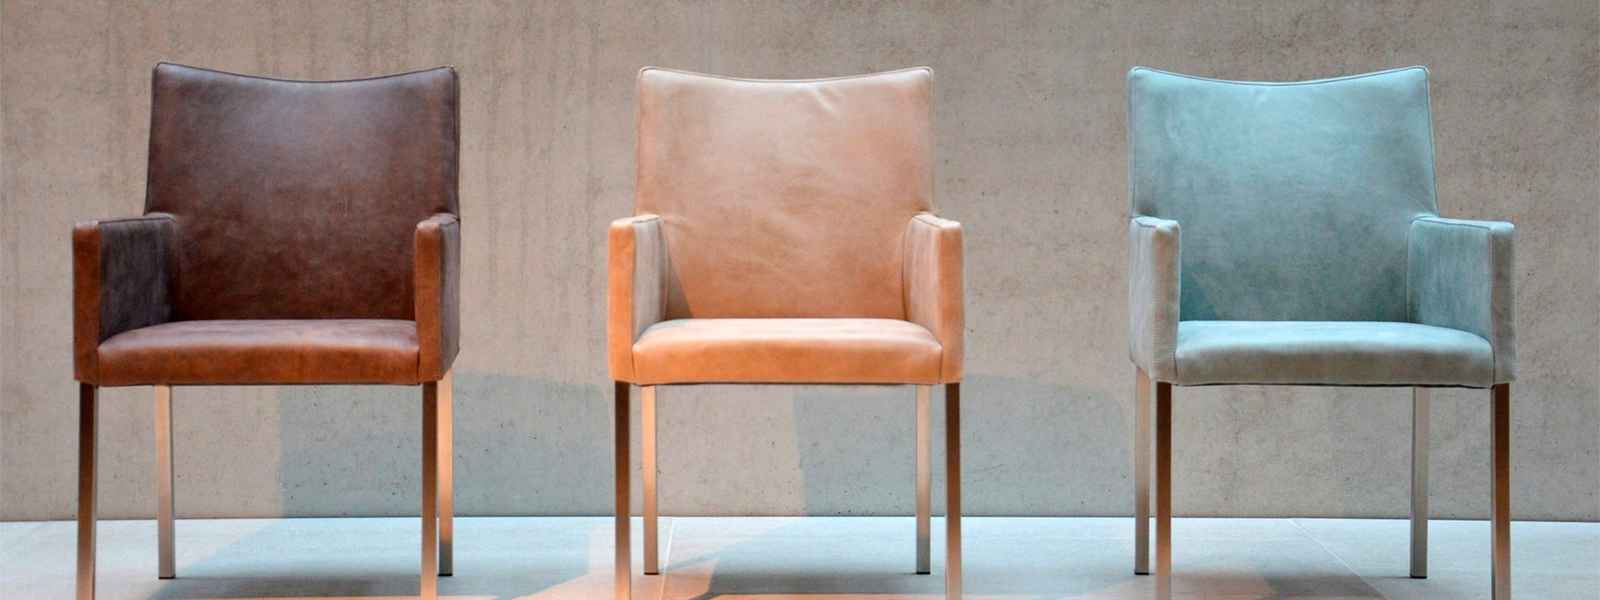 jankurtz Stühle